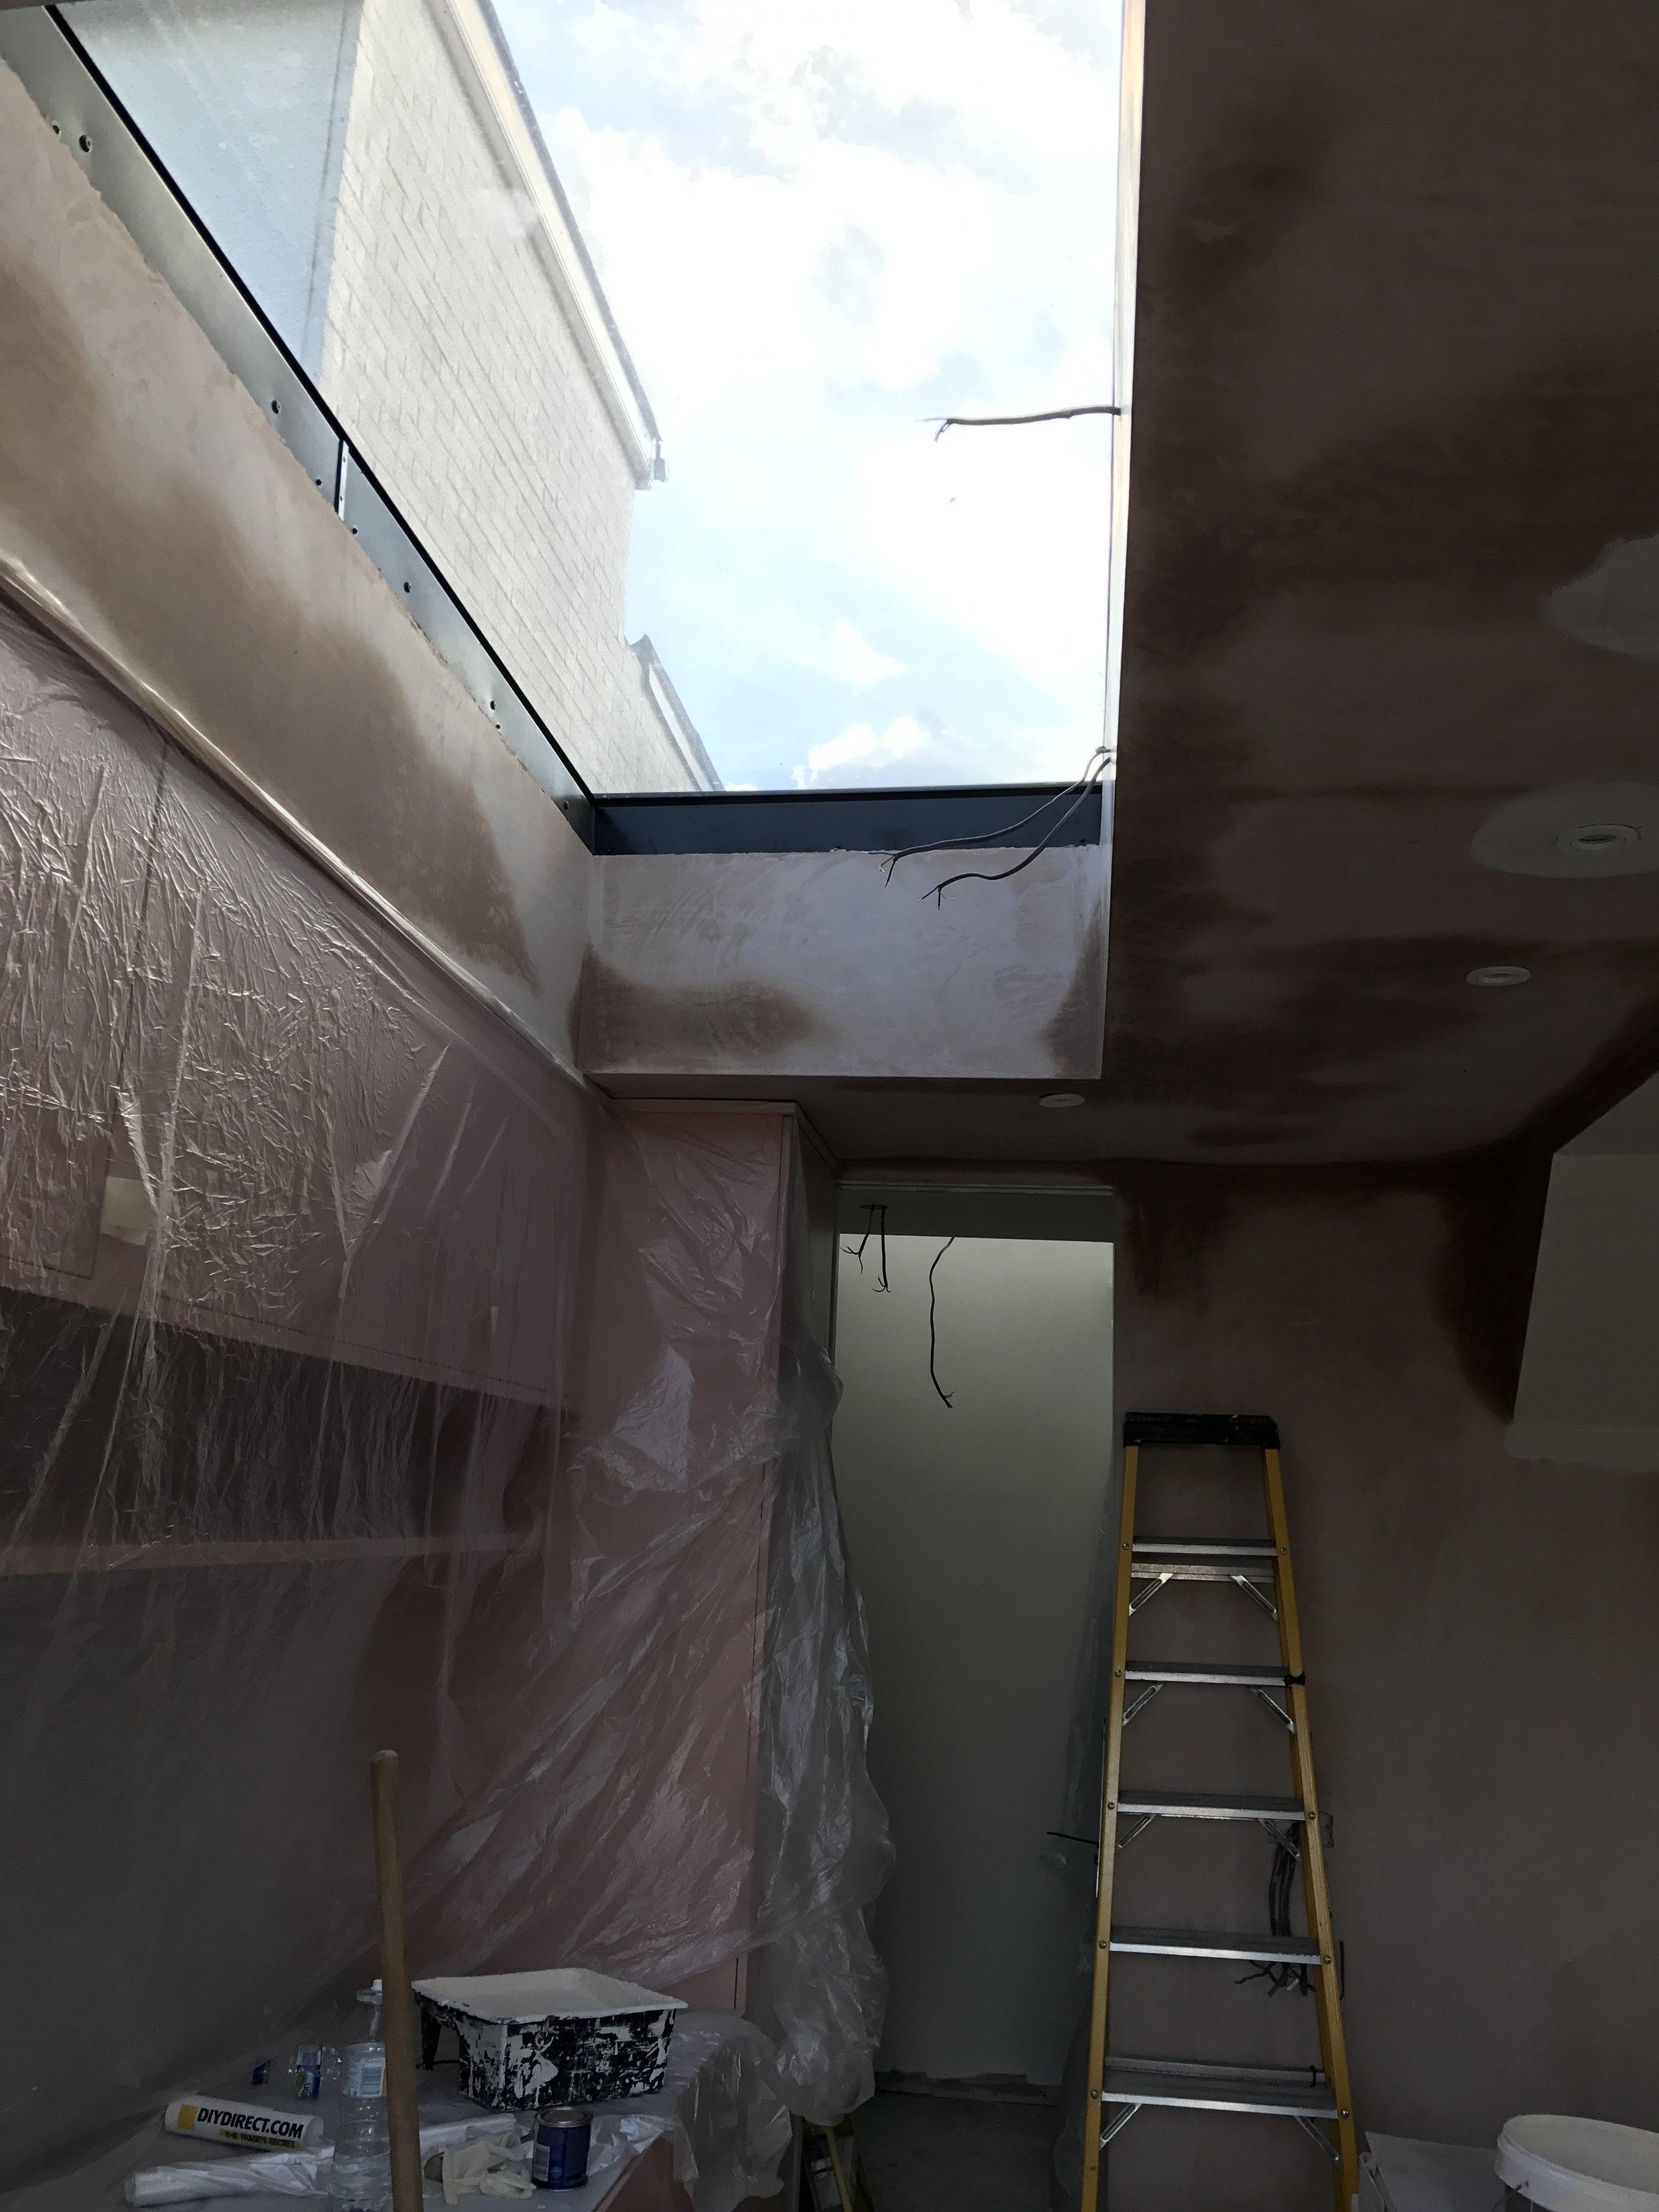 Hopping tHe plaster drys soon